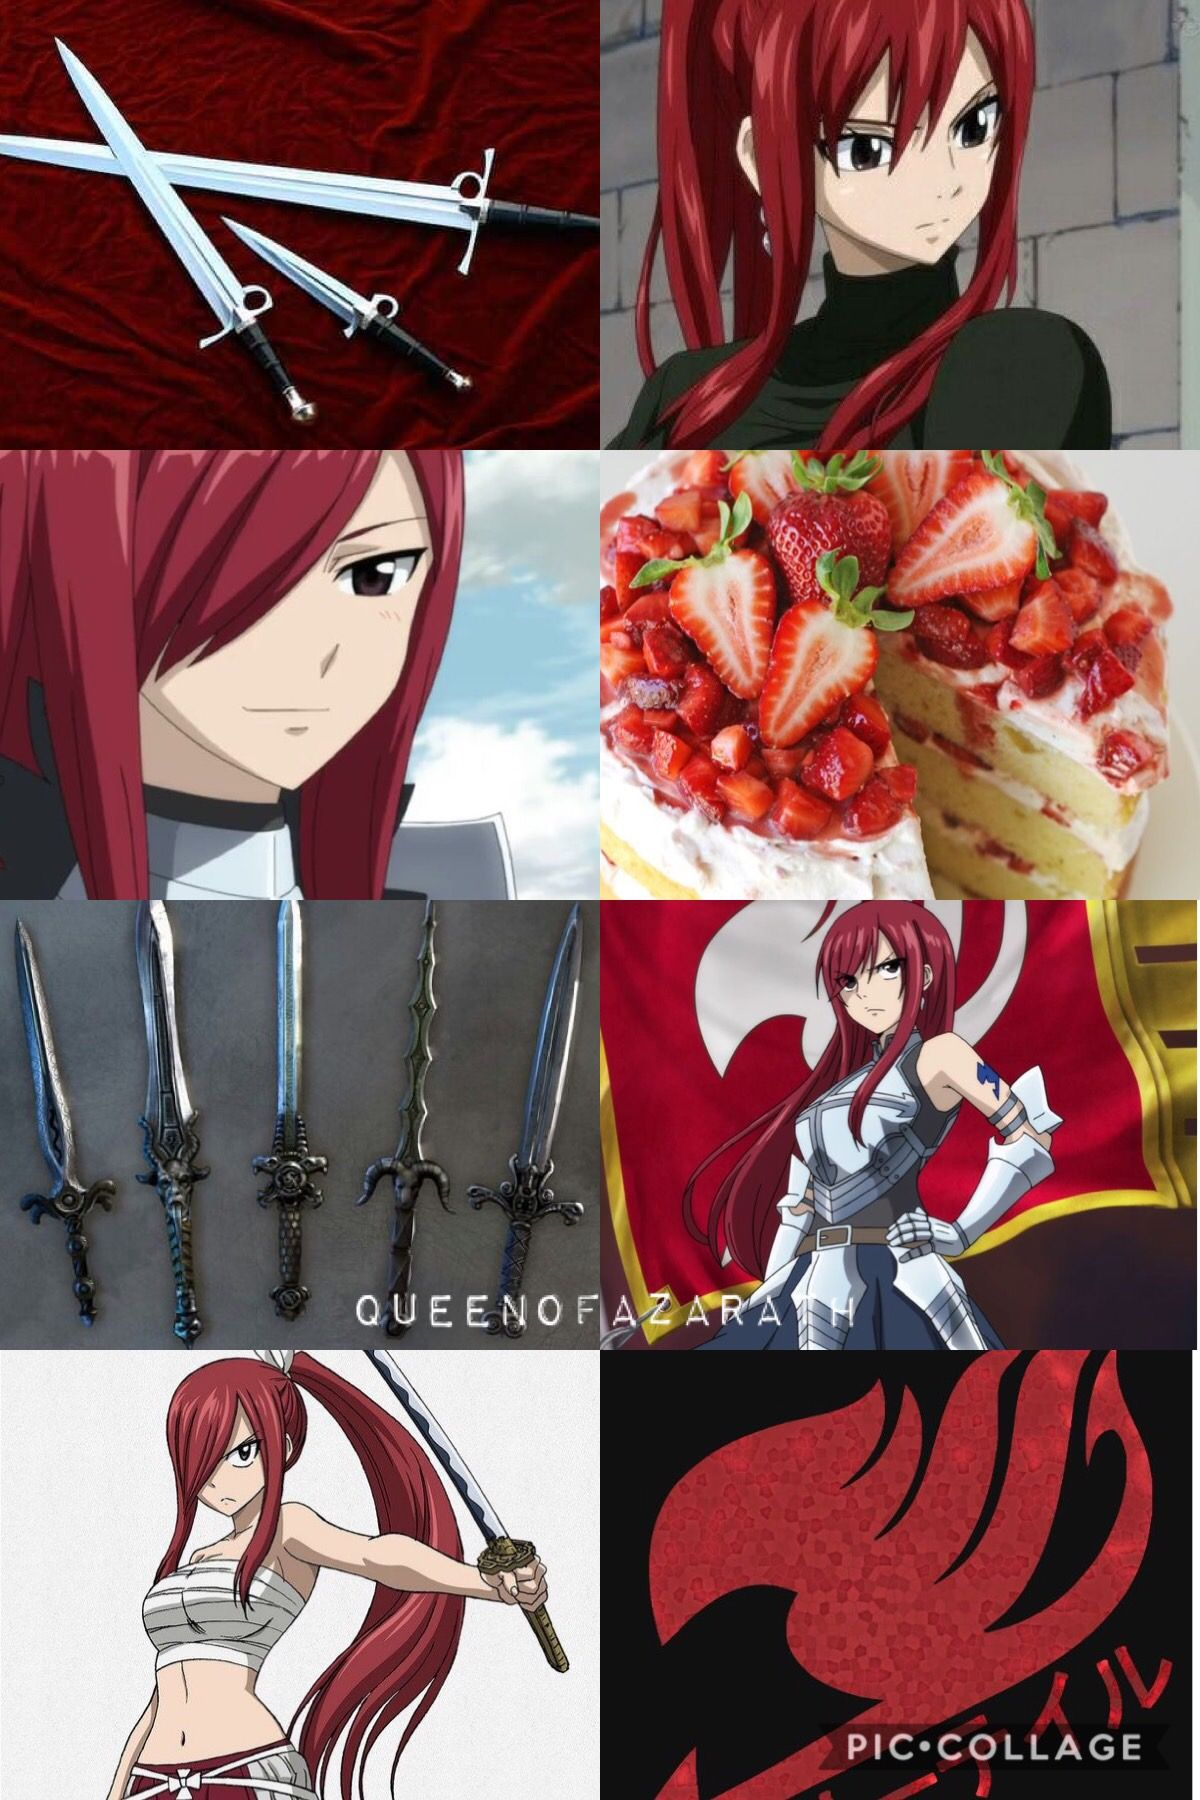 Mirajane Fairy Tale Anime Characters See more ideas about aesthetic anime, kawaii anime, anime icons. mirajane fairy tale anime characters